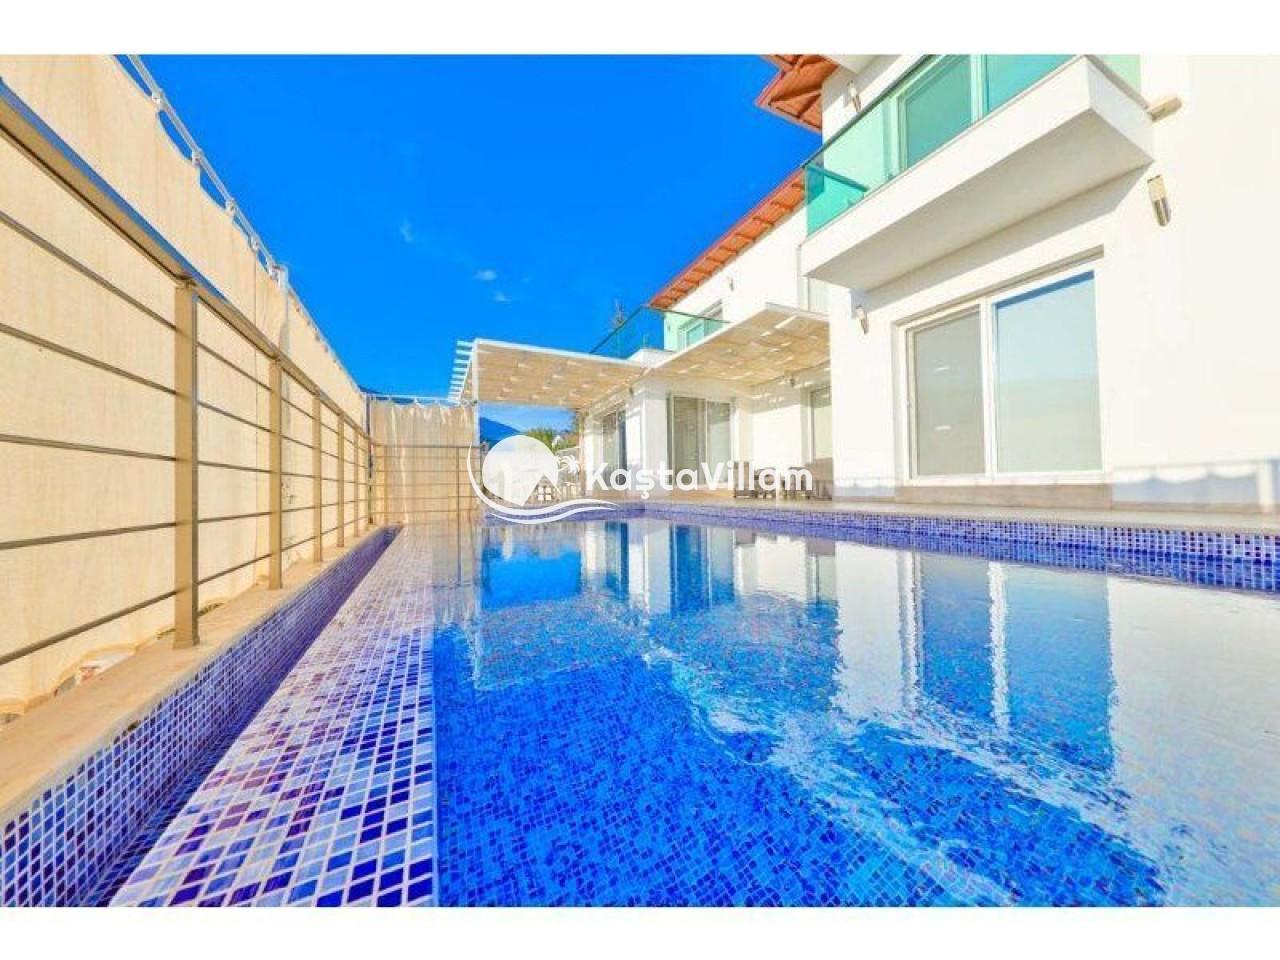 Kaş kiralık villa / Villa james 5 - Kaştavillam